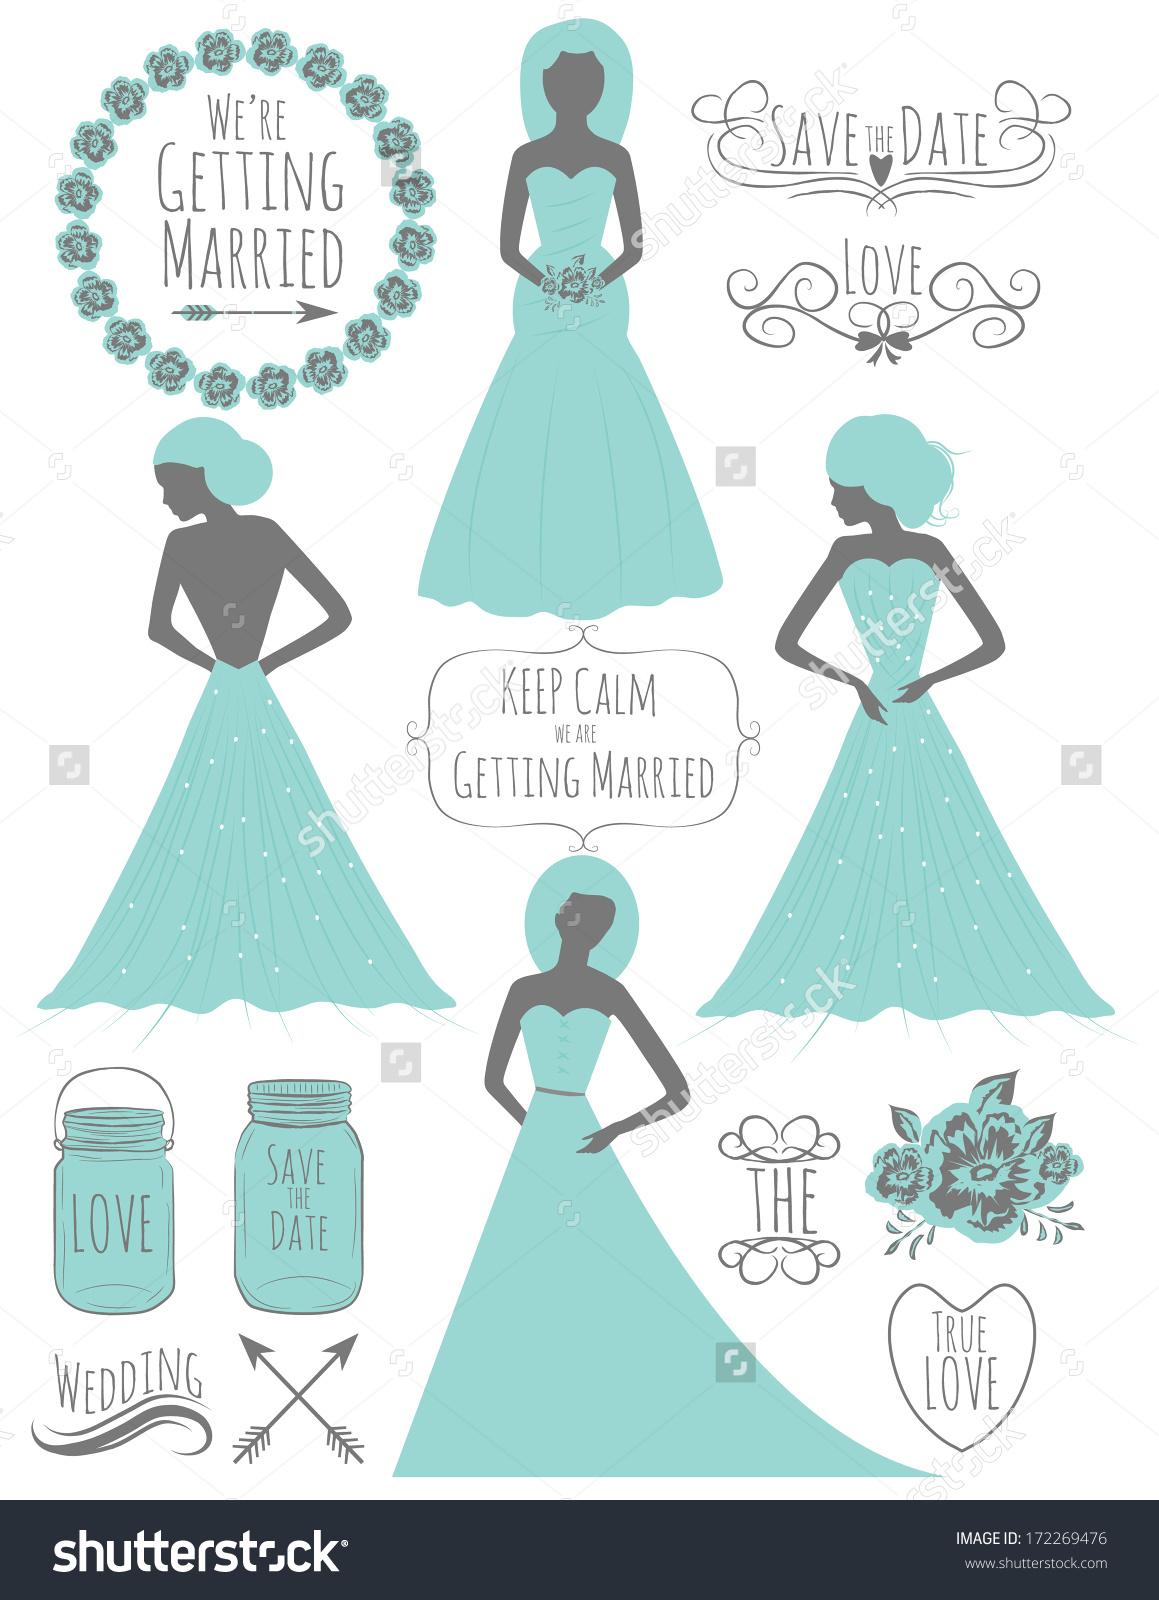 Wedding Clipart Set Turquoise Wedding Dress Stock Vector 172269476.